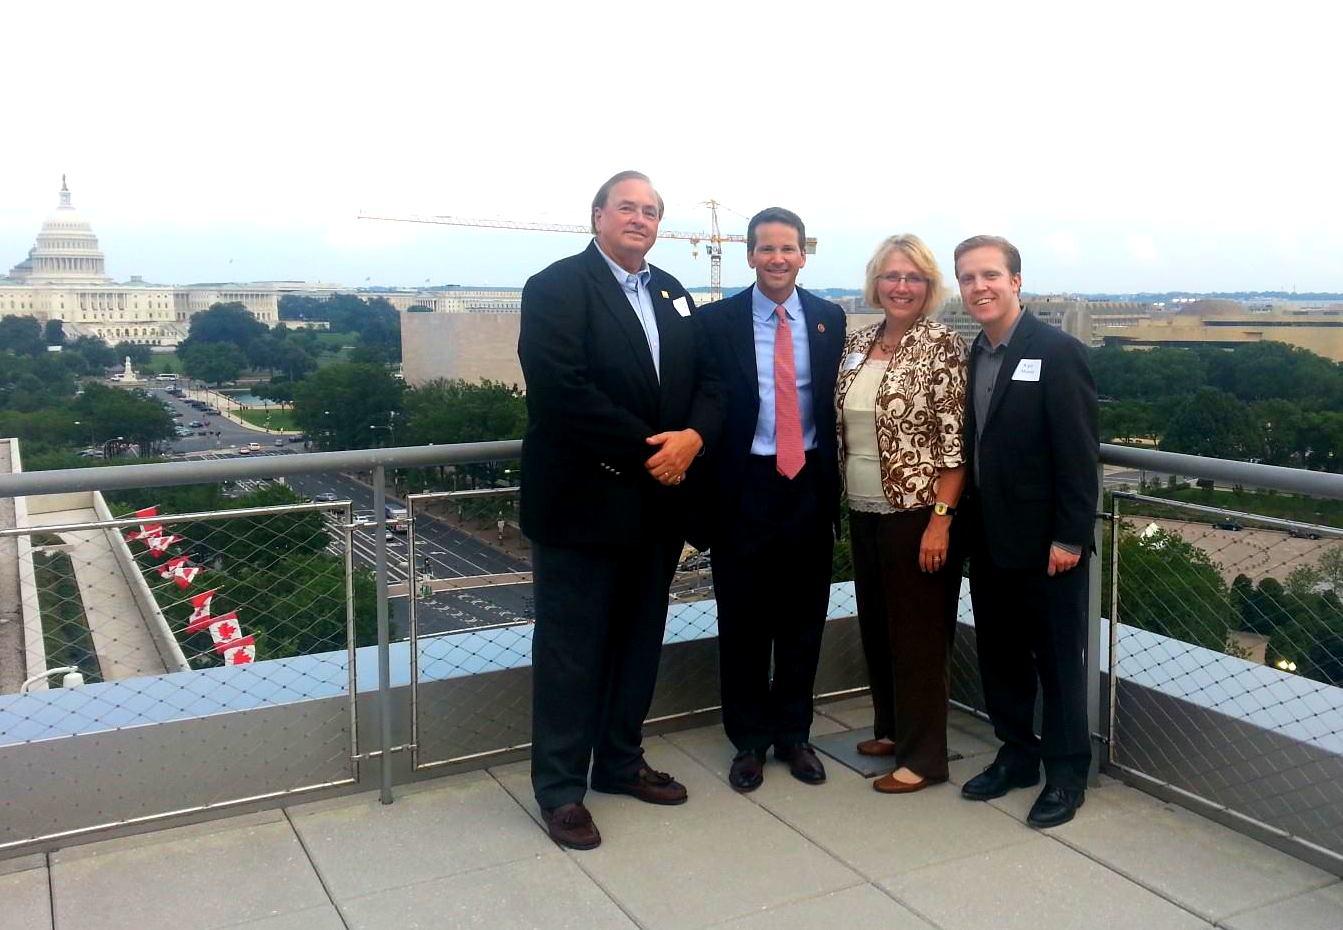 GREDF President Talks Critical Issues During Washington, D.C. Trip